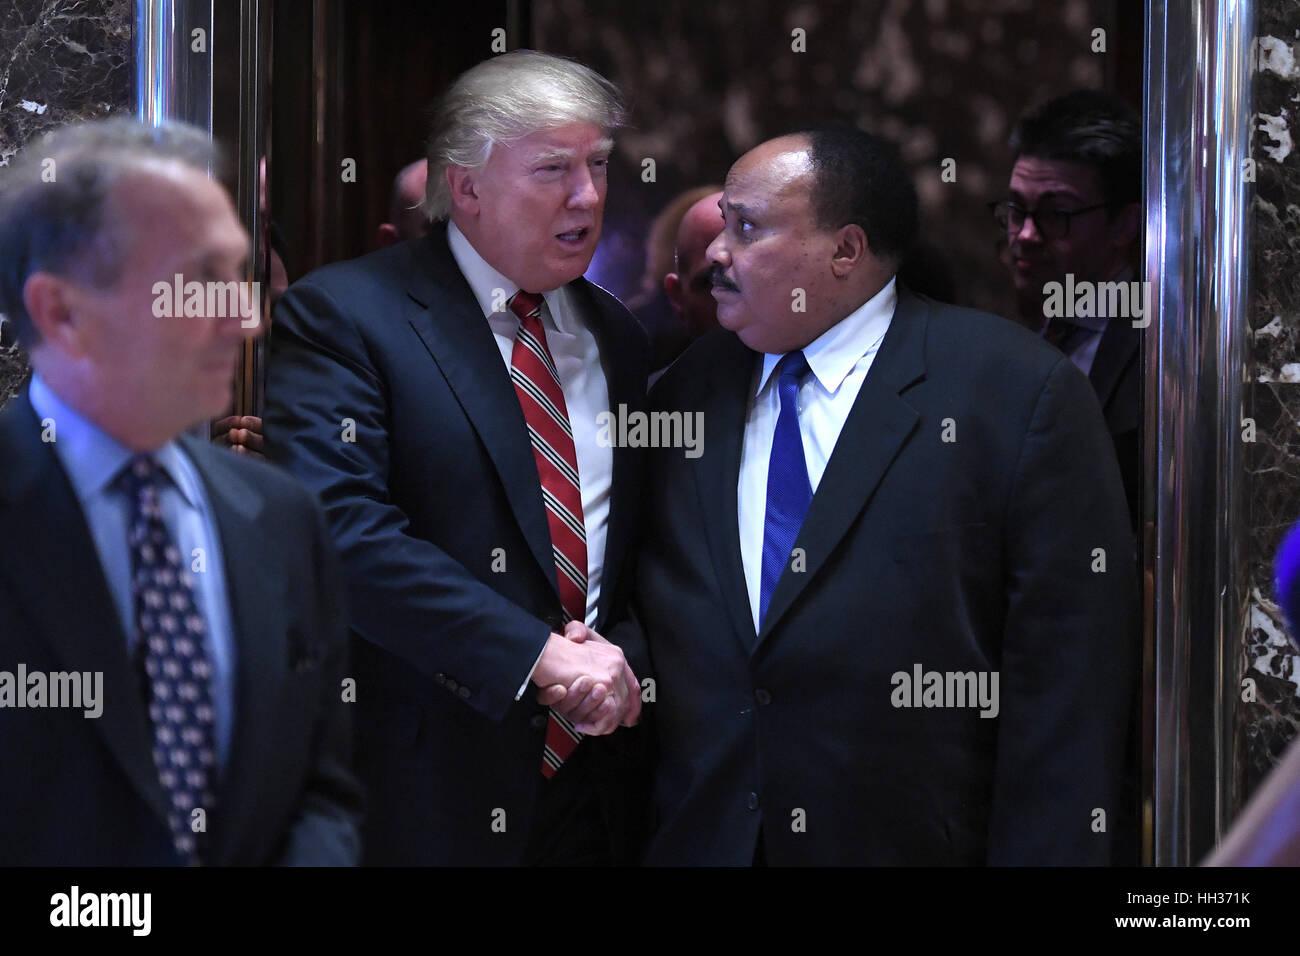 Nueva York, Estados Unidos. 16 ene, 2017. Presidente electo Donald J. Trump agita las manos con Martin Luther King Imagen De Stock